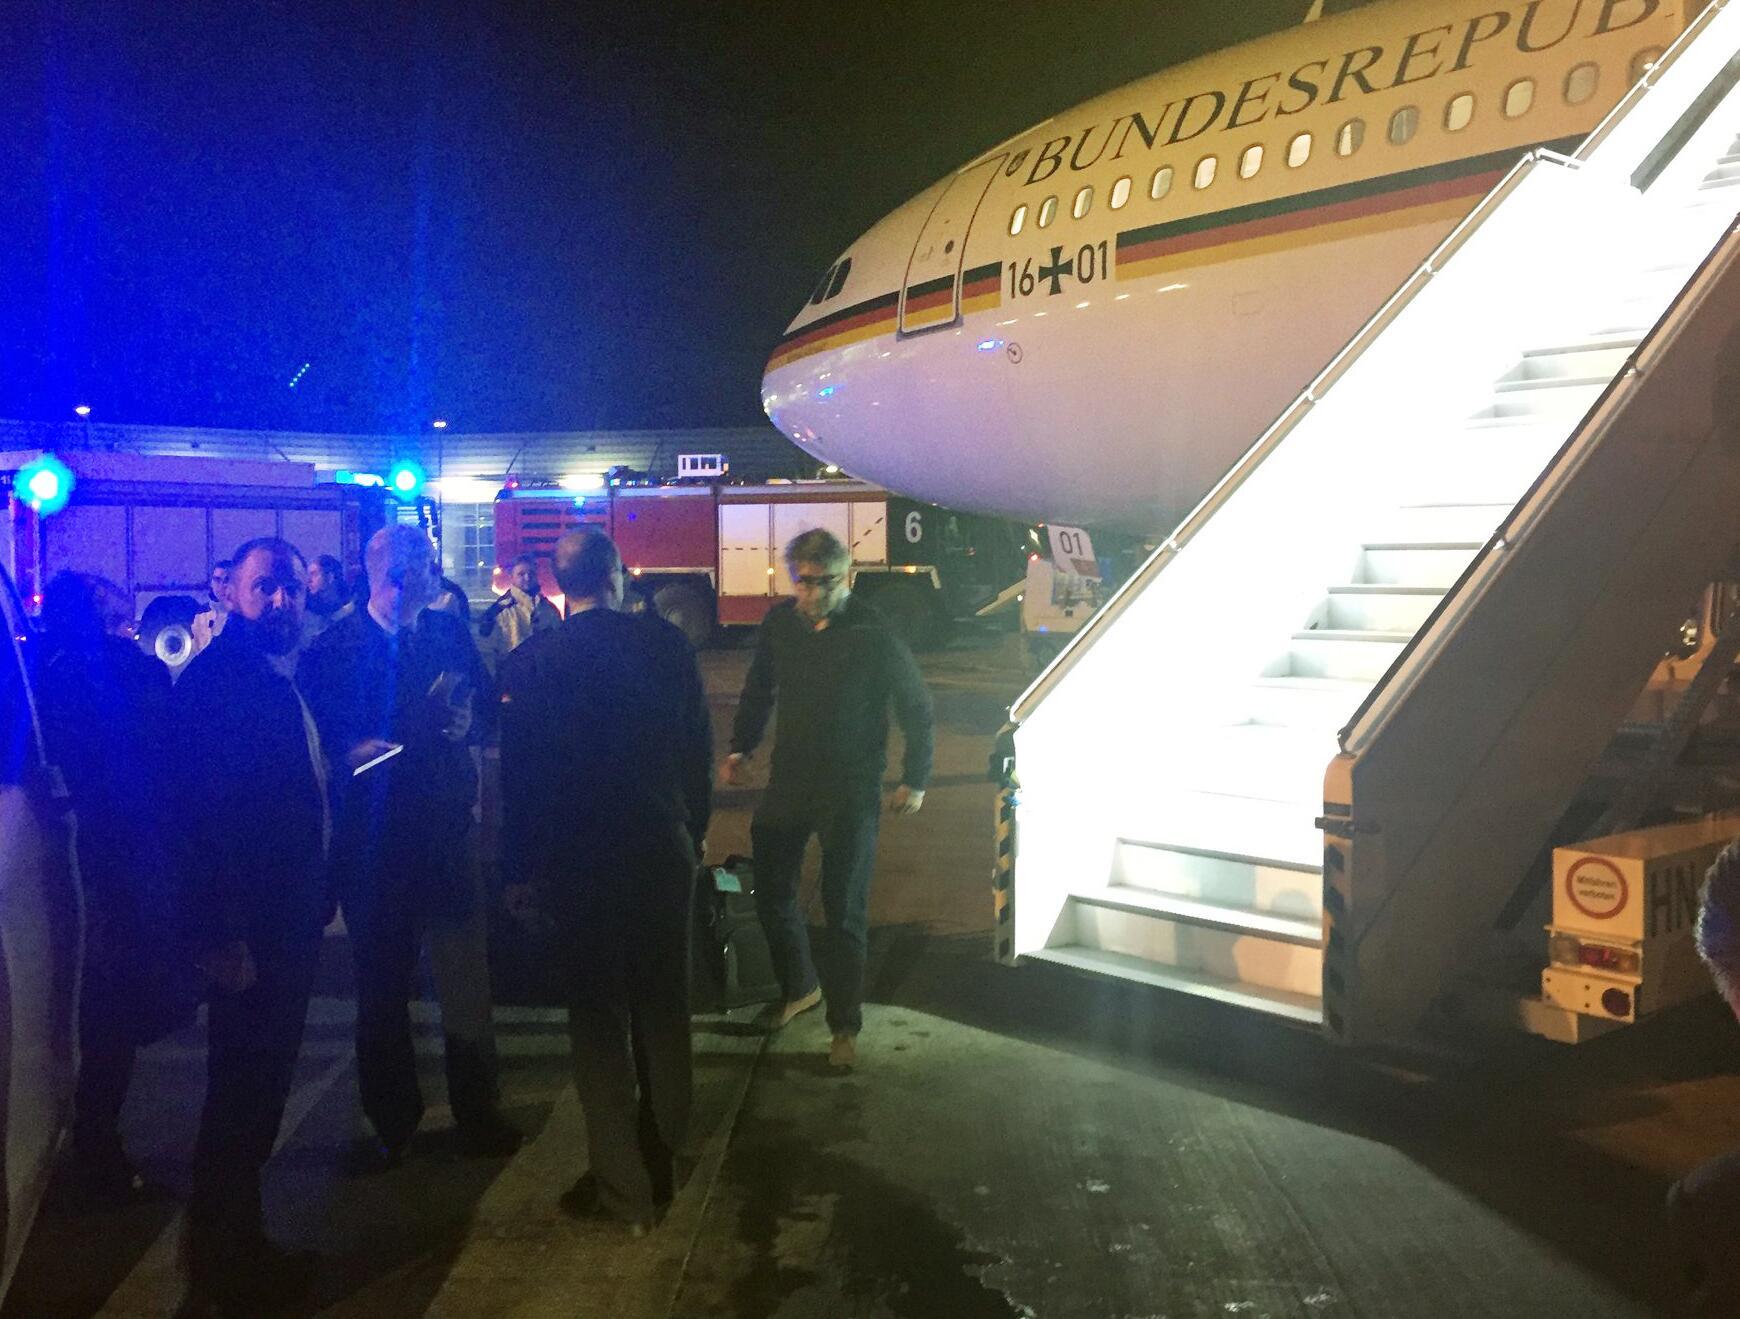 Bild zu Merkel muss Flug zu G20 unterbrechen